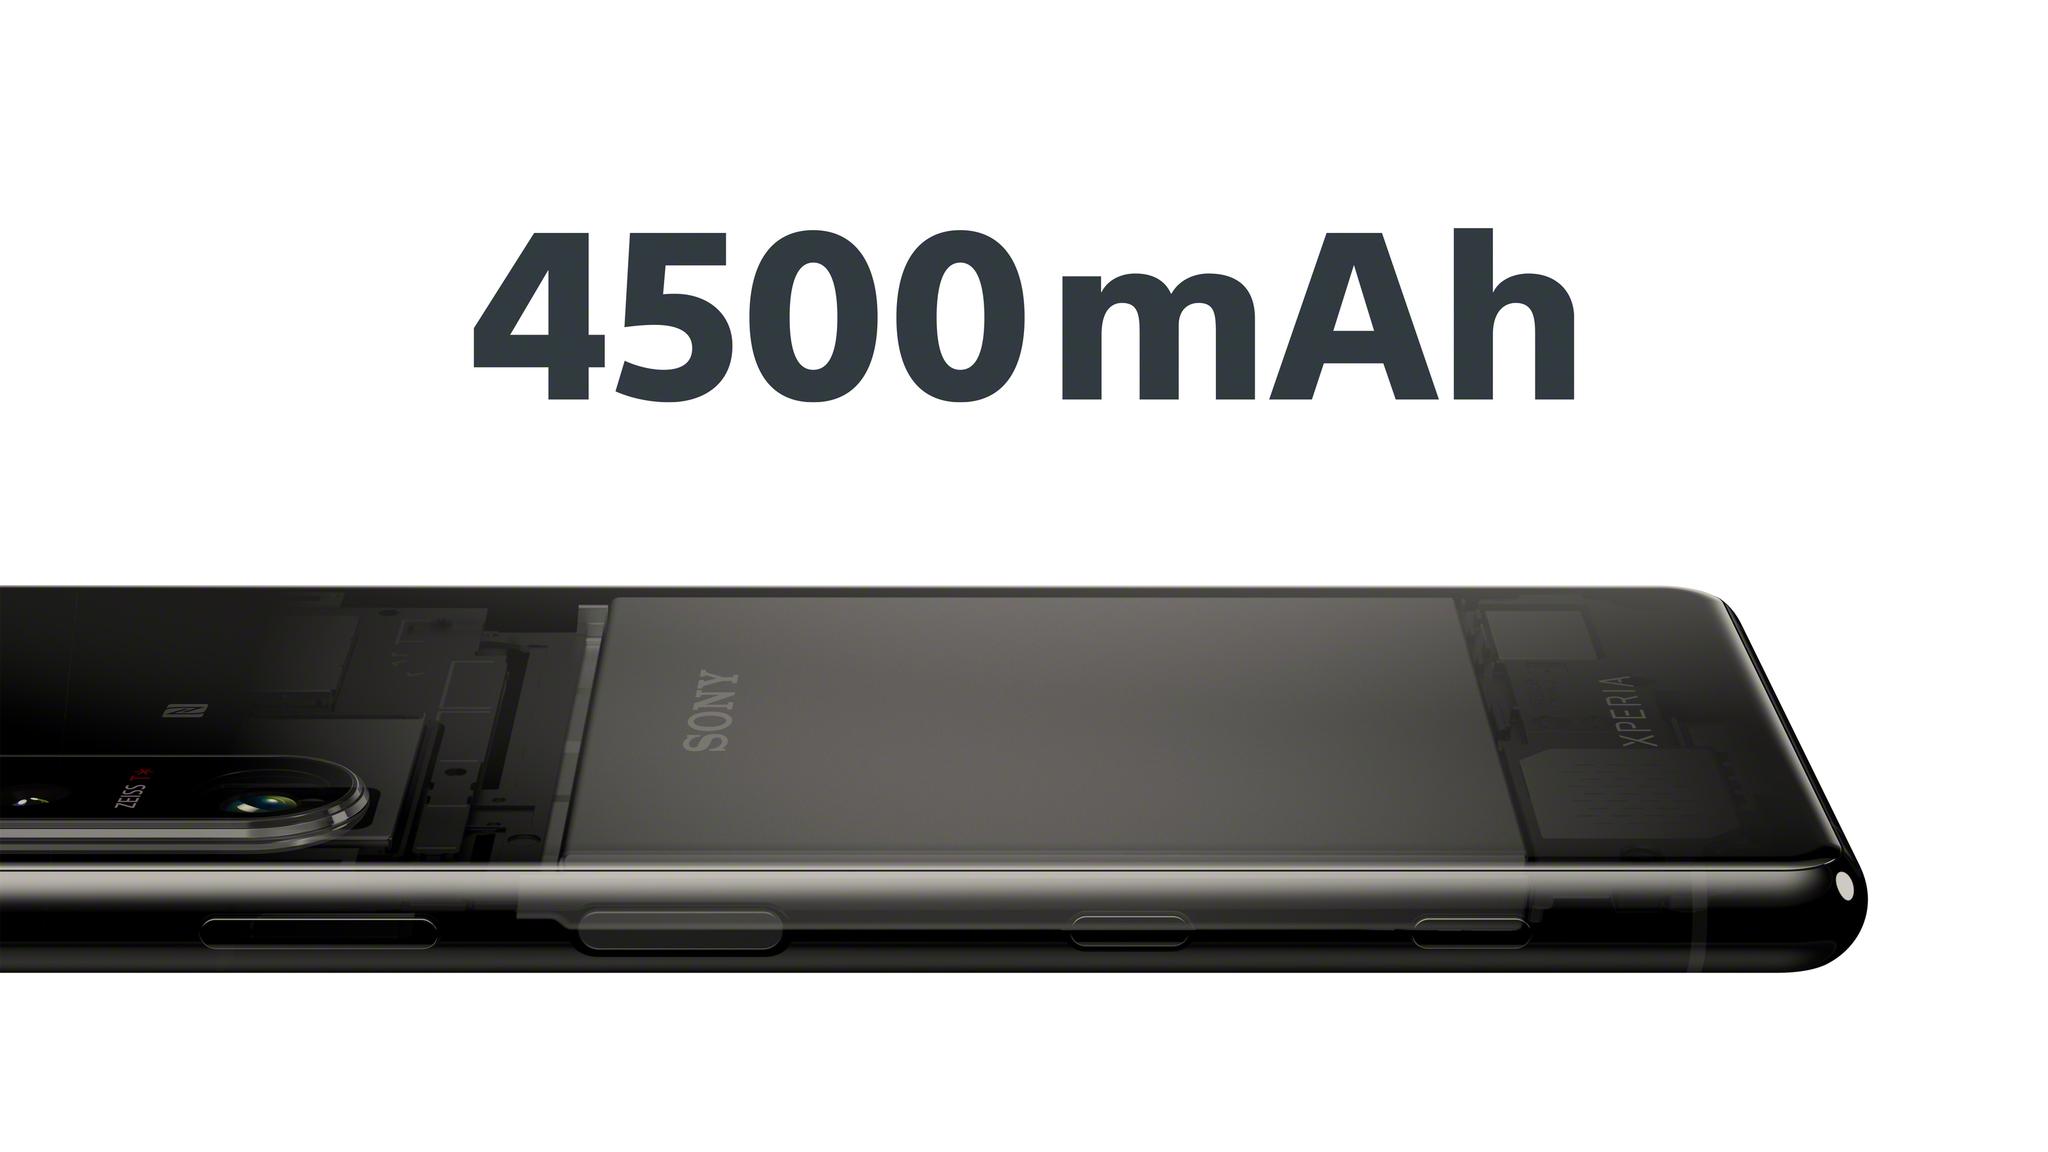 Компактный смартфон Xperia 5 III чёрного цвета с аккумулятором 4500 мАч